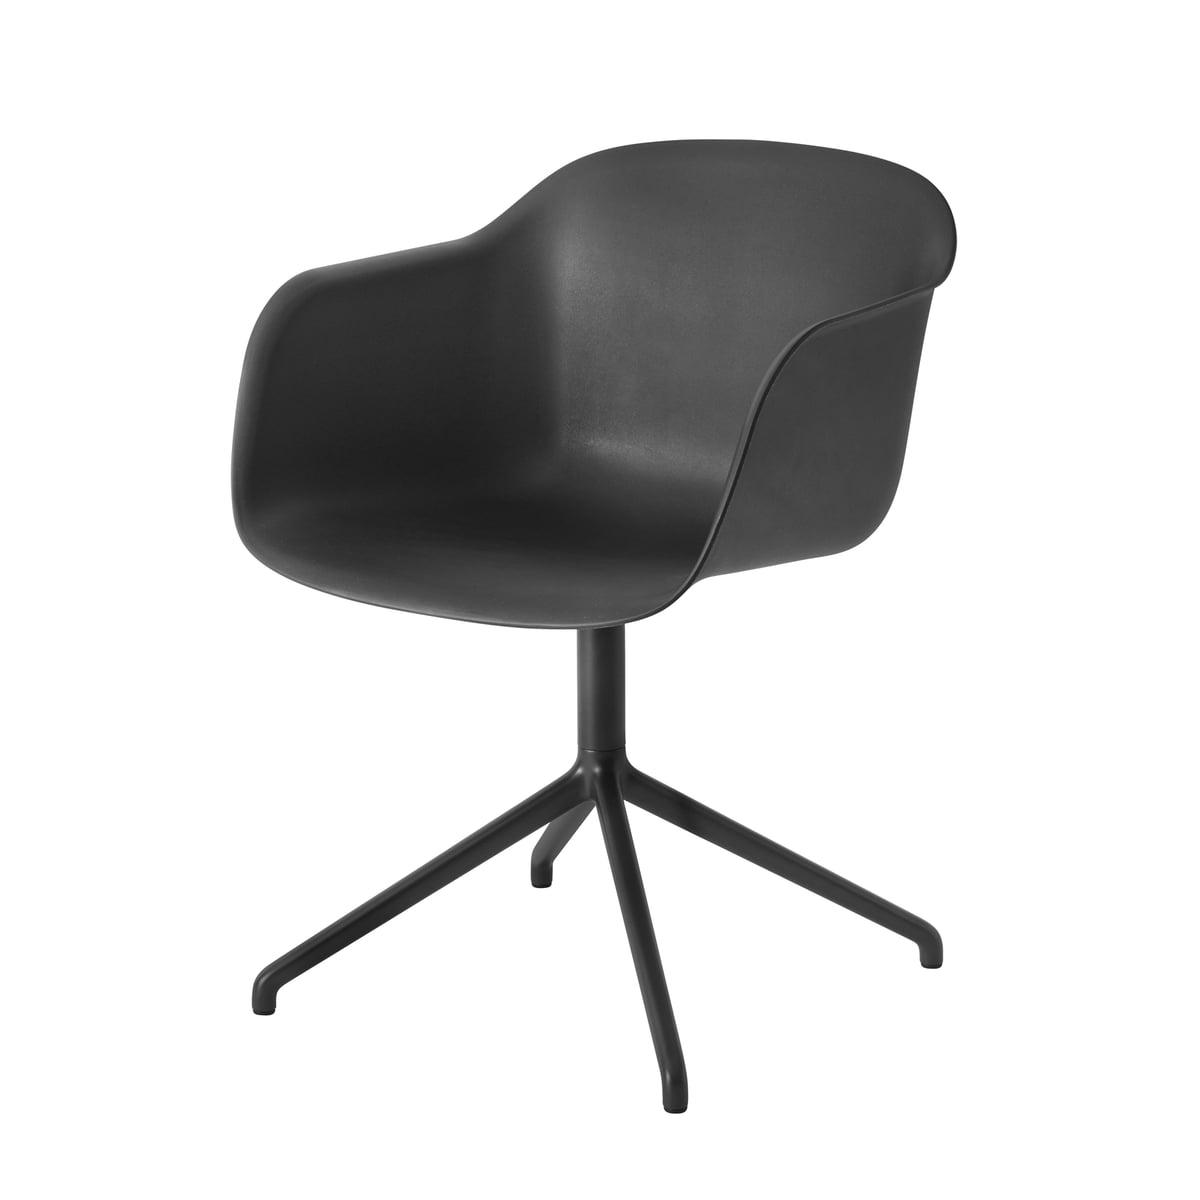 Sensational Muuto Fiber Chair Swivel Base Grey Beatyapartments Chair Design Images Beatyapartmentscom